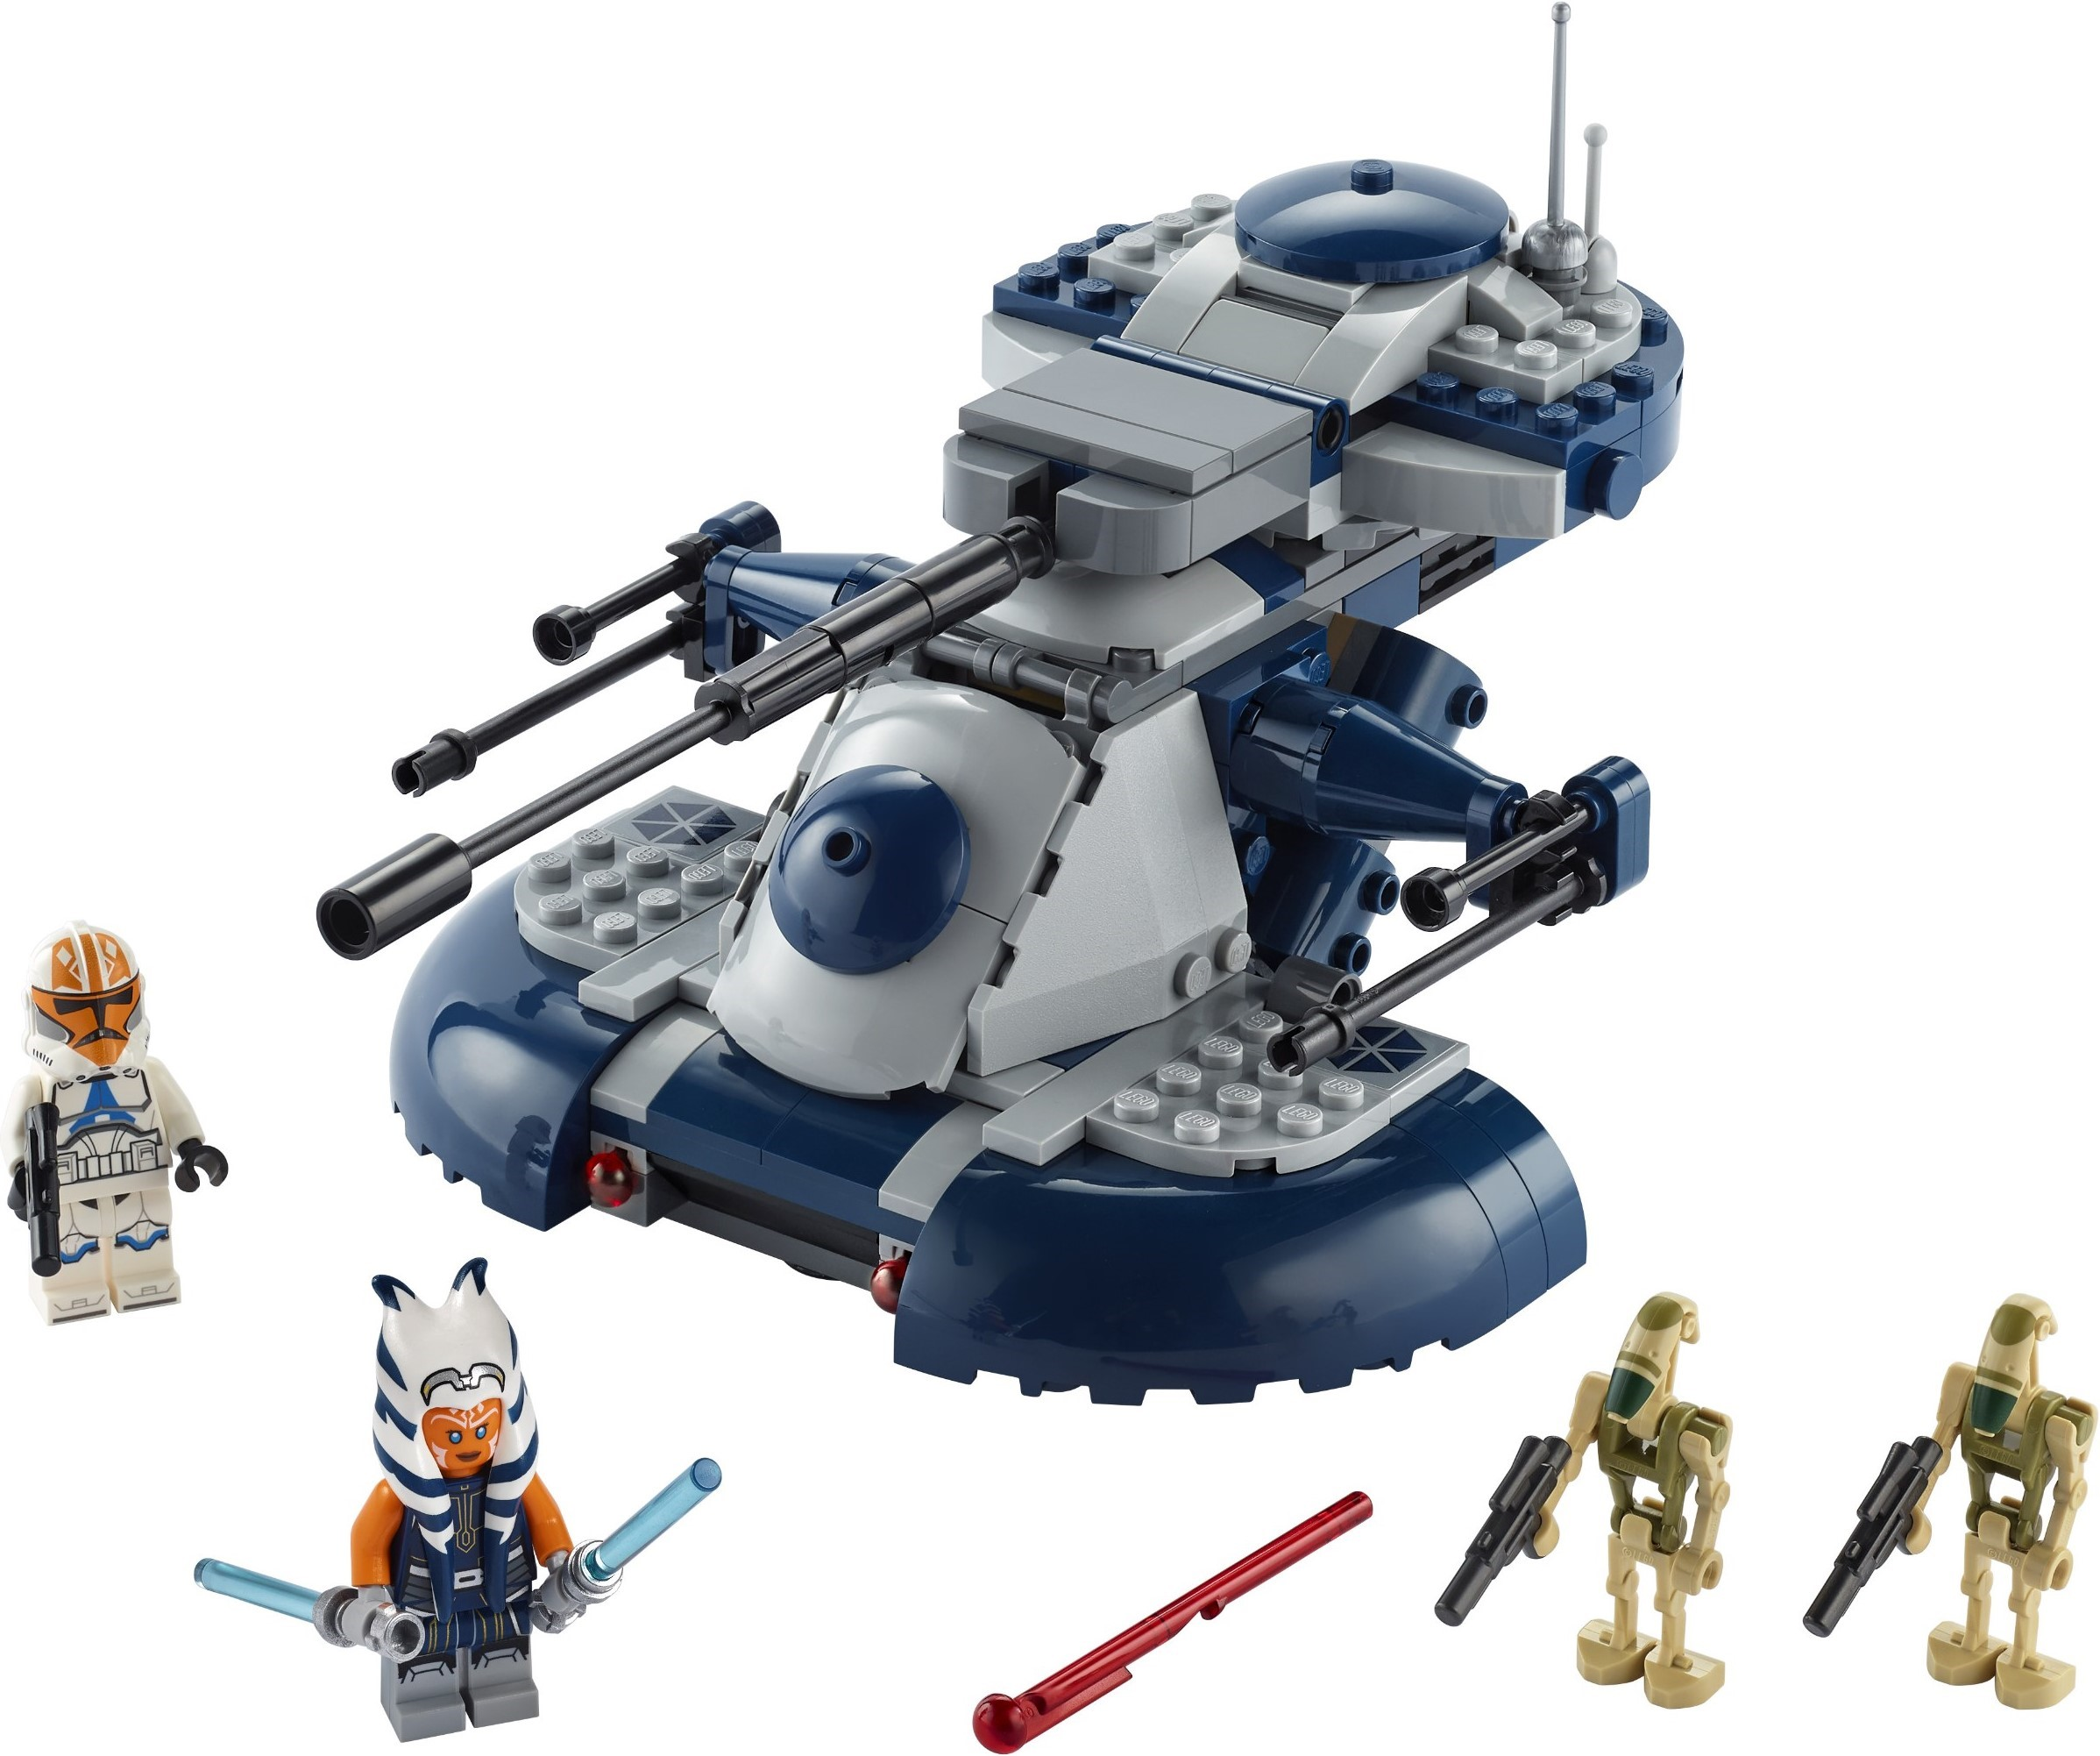 Star Wars 2020 Brickset Lego Set Guide And Database